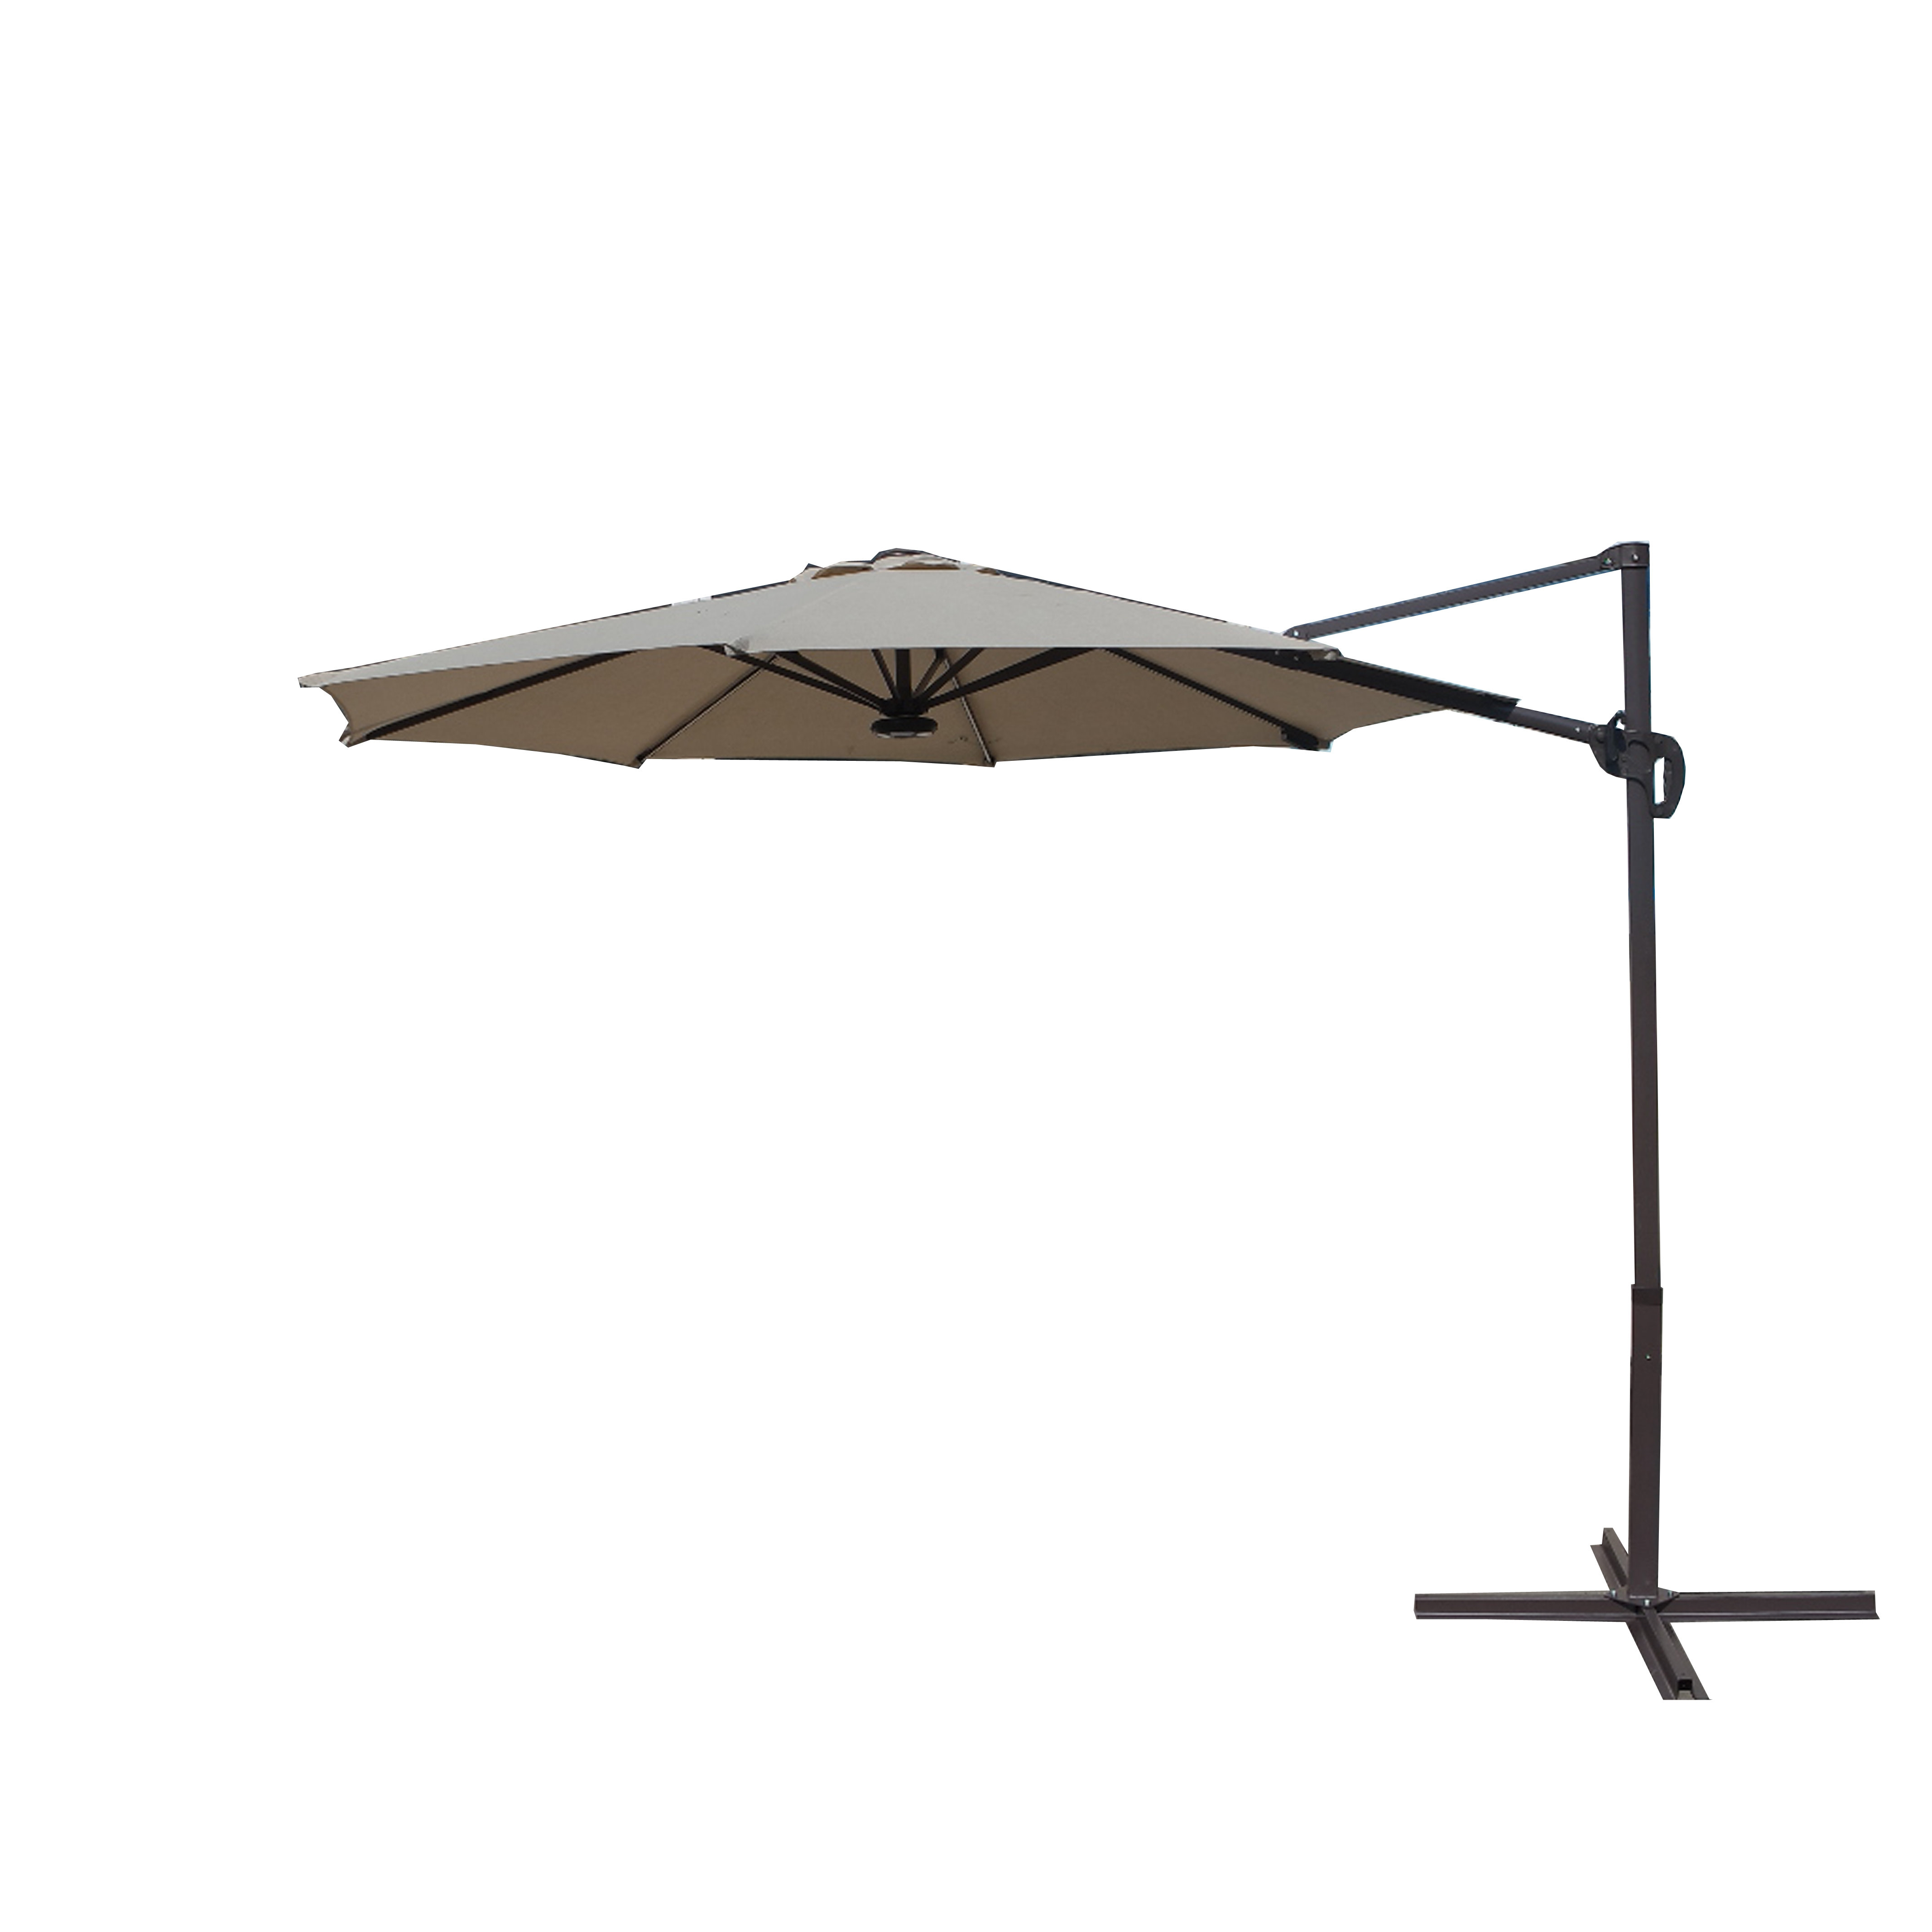 Newest Justis Cantilever Umbrellas Within Corbridge 9' Cantilever Umbrella (Gallery 9 of 20)